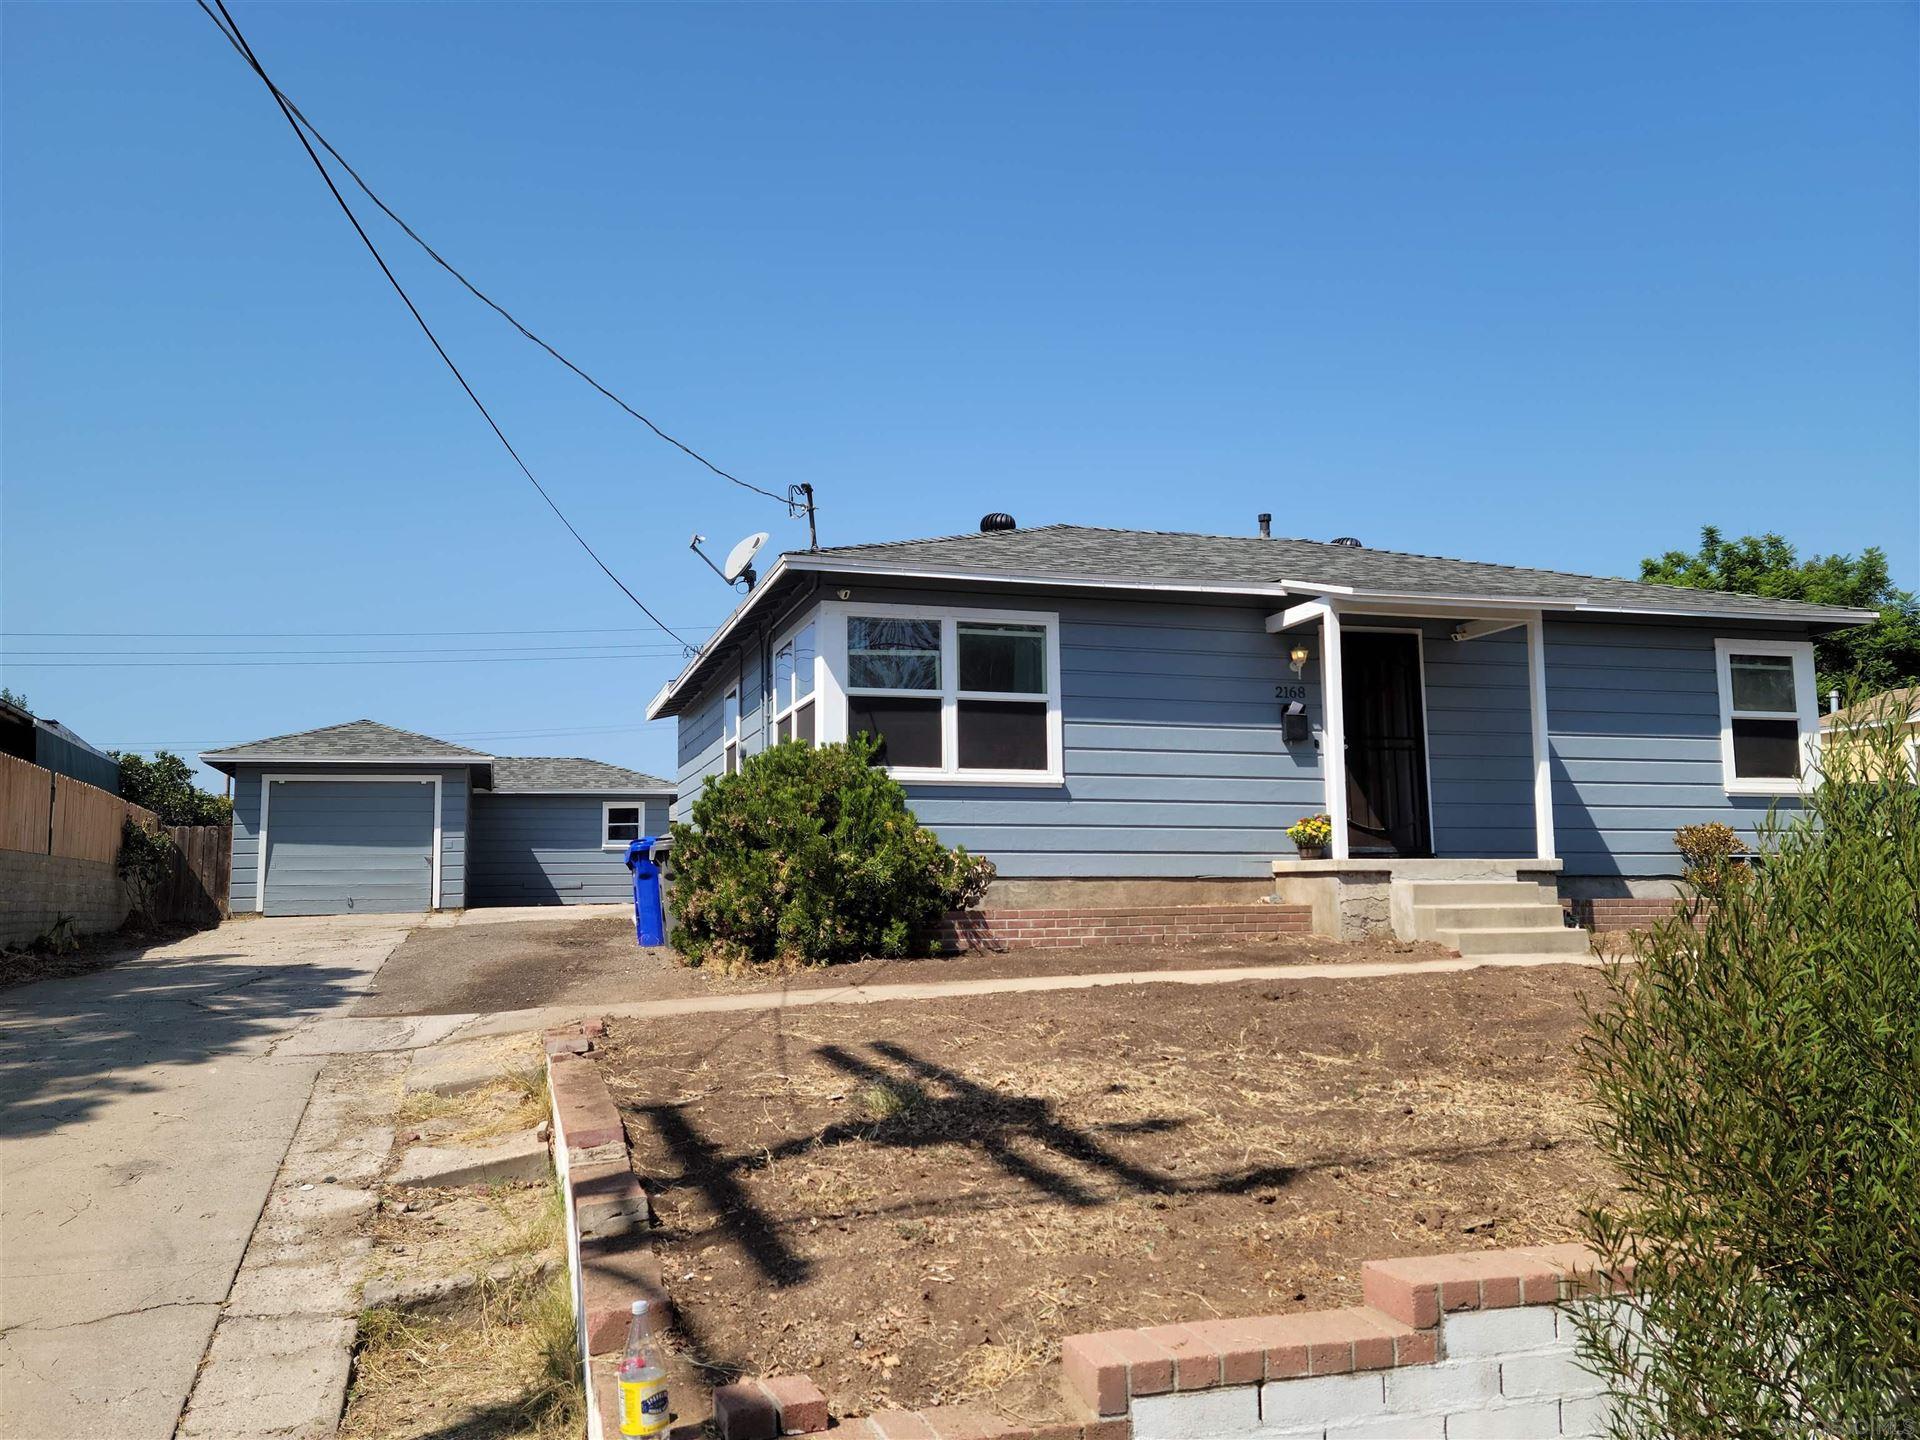 Photo of 2168 McKnight, Lemon Grove, CA 91945 (MLS # 210025920)